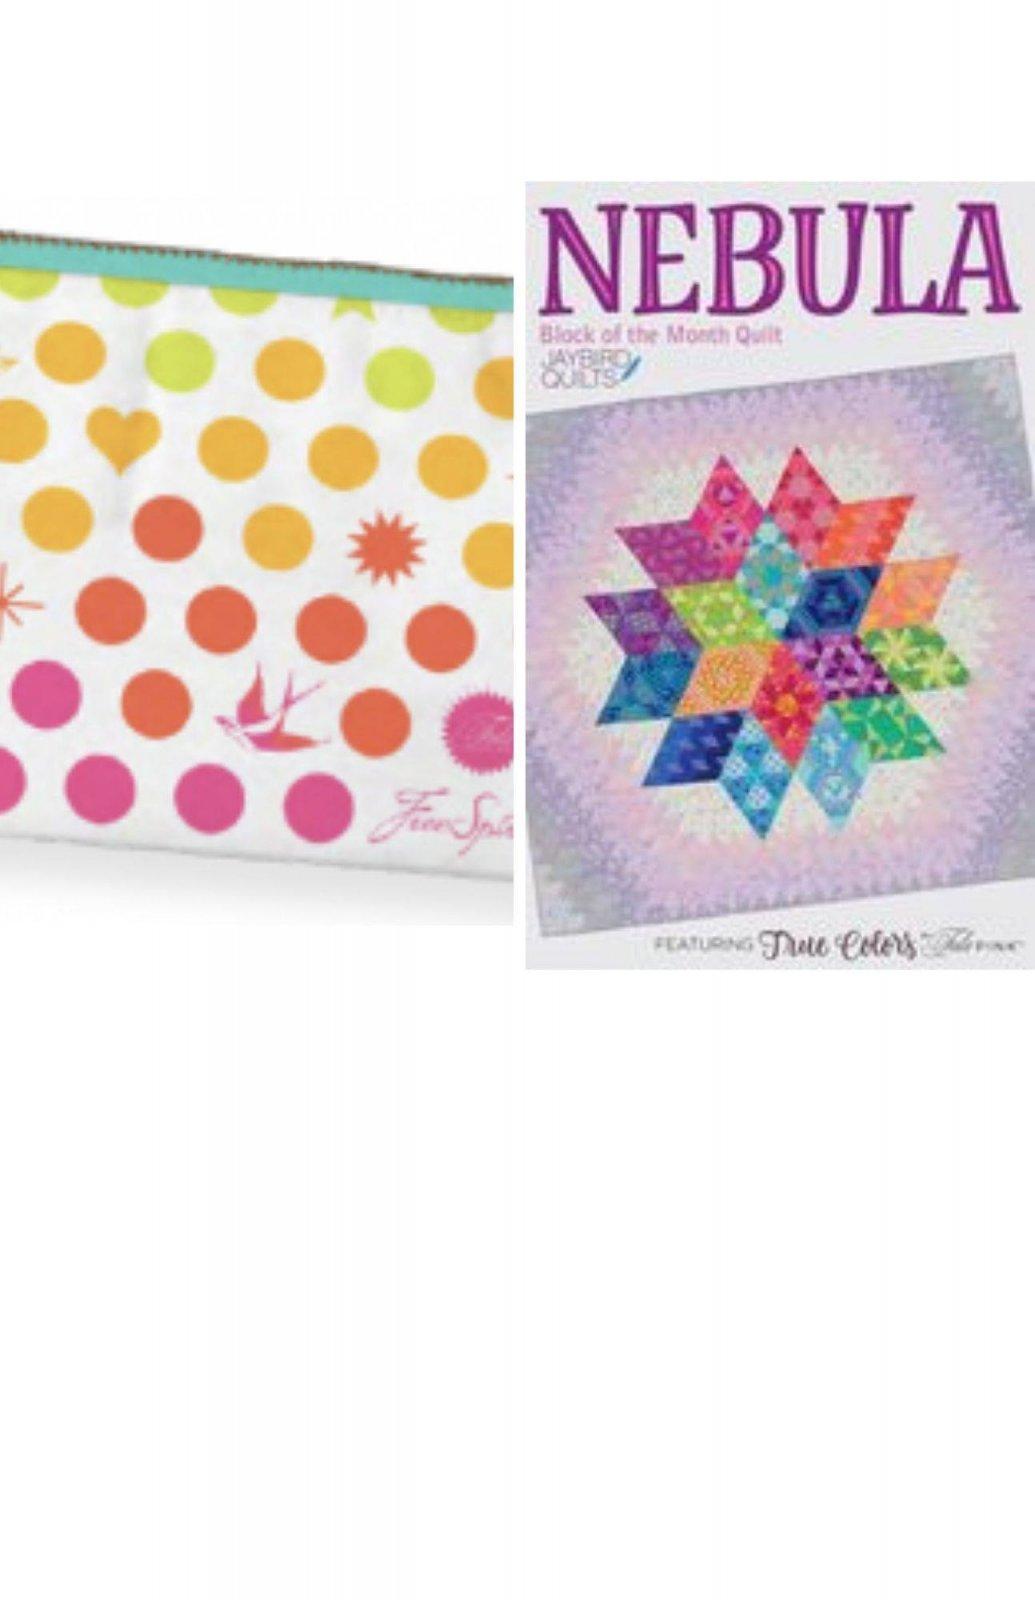 Nebula BOM includes SWAG! Kit 7